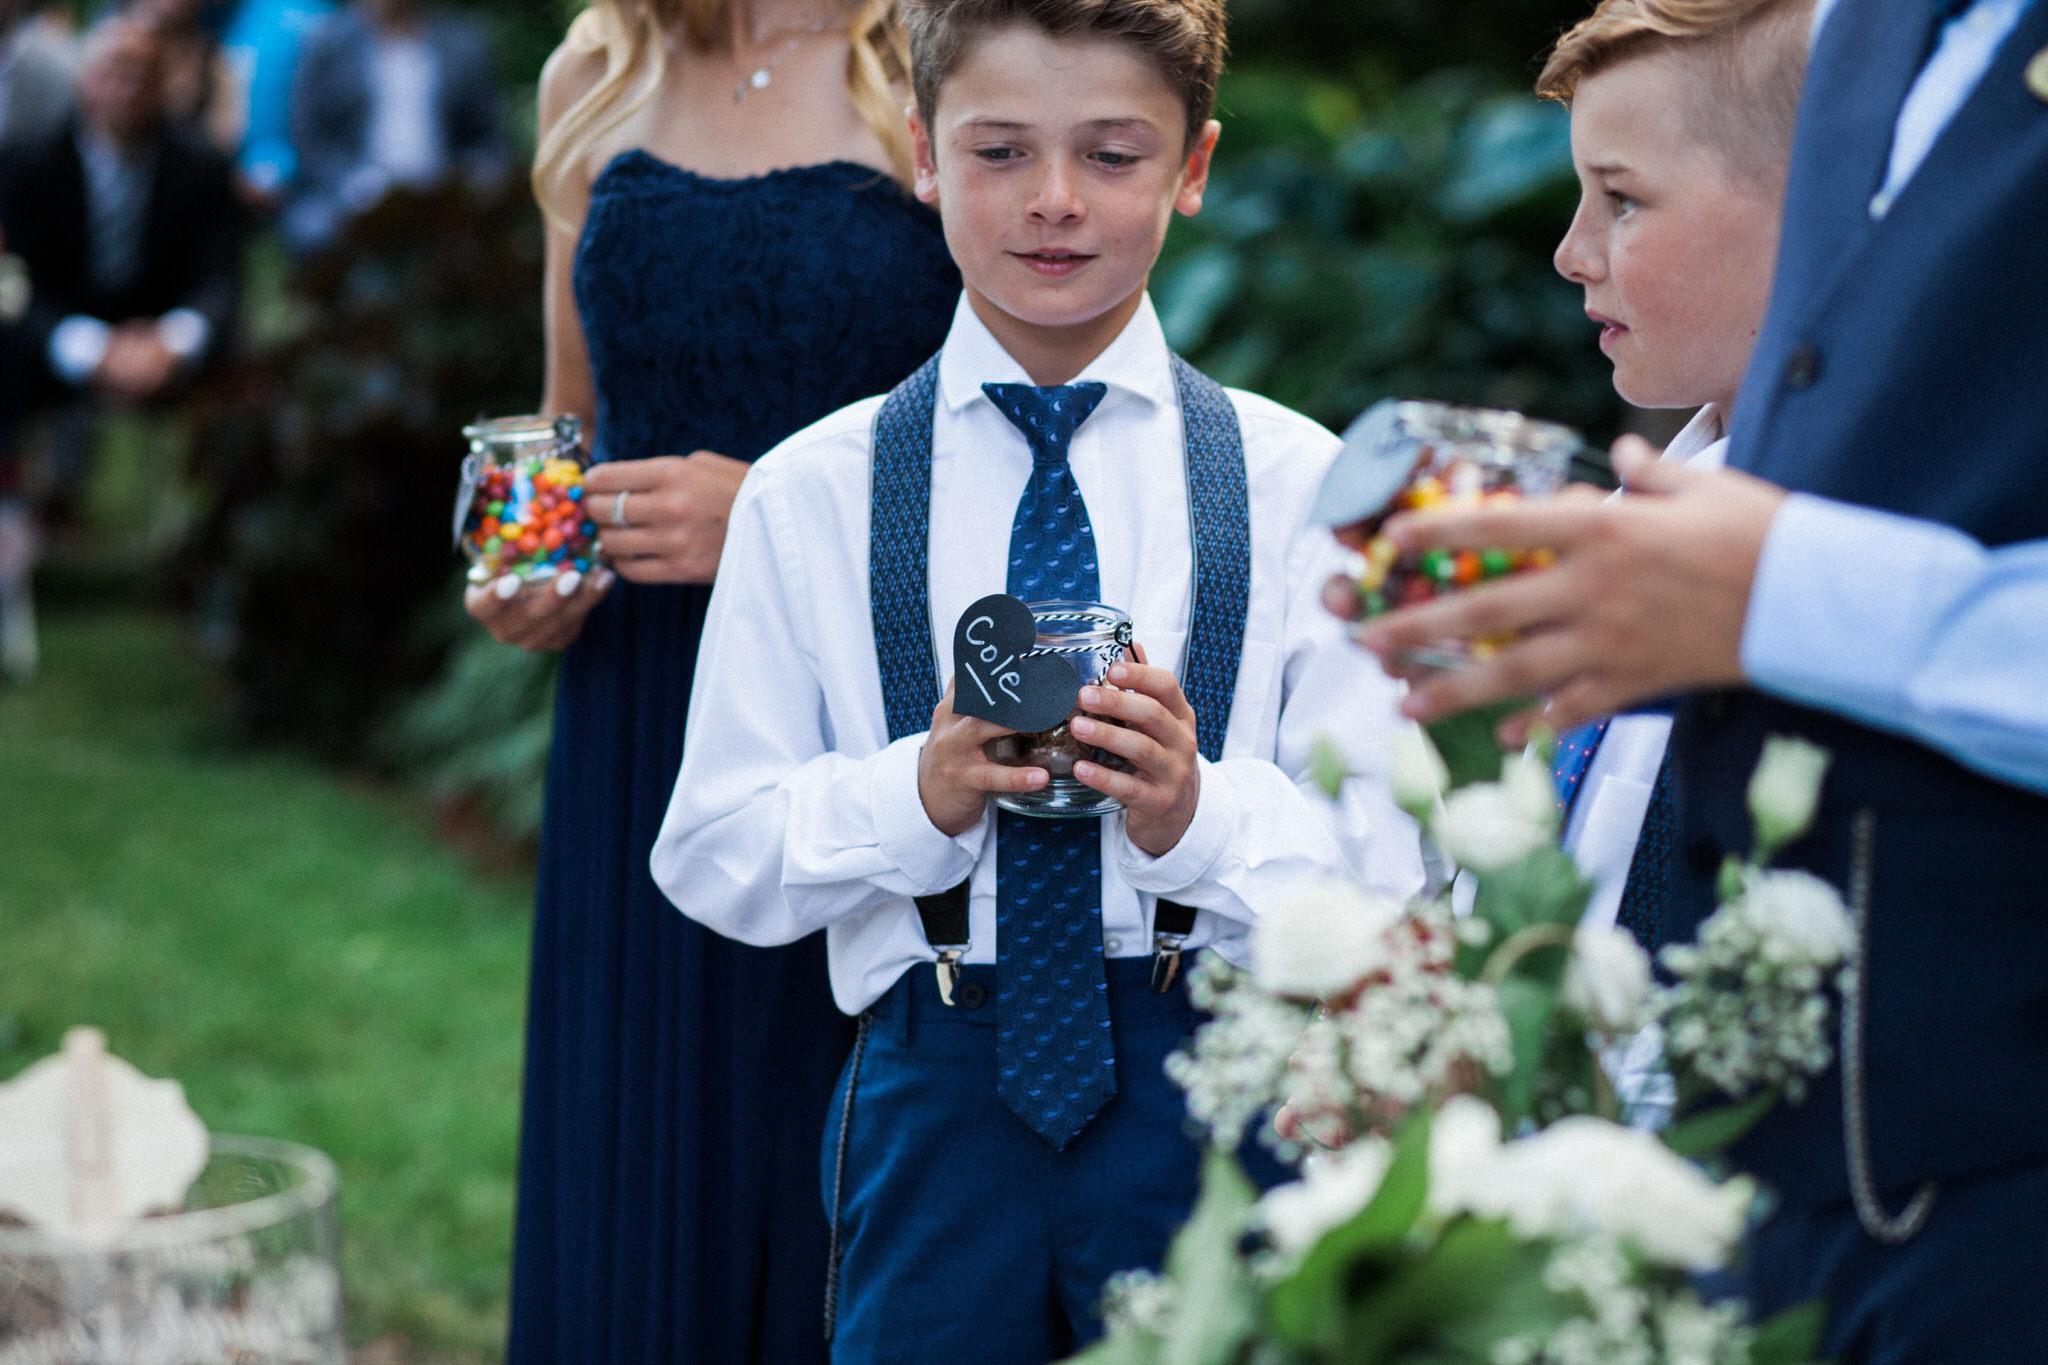 Harvest Restaurant Wedding Brooklin Ontario - Candy ceremony for children